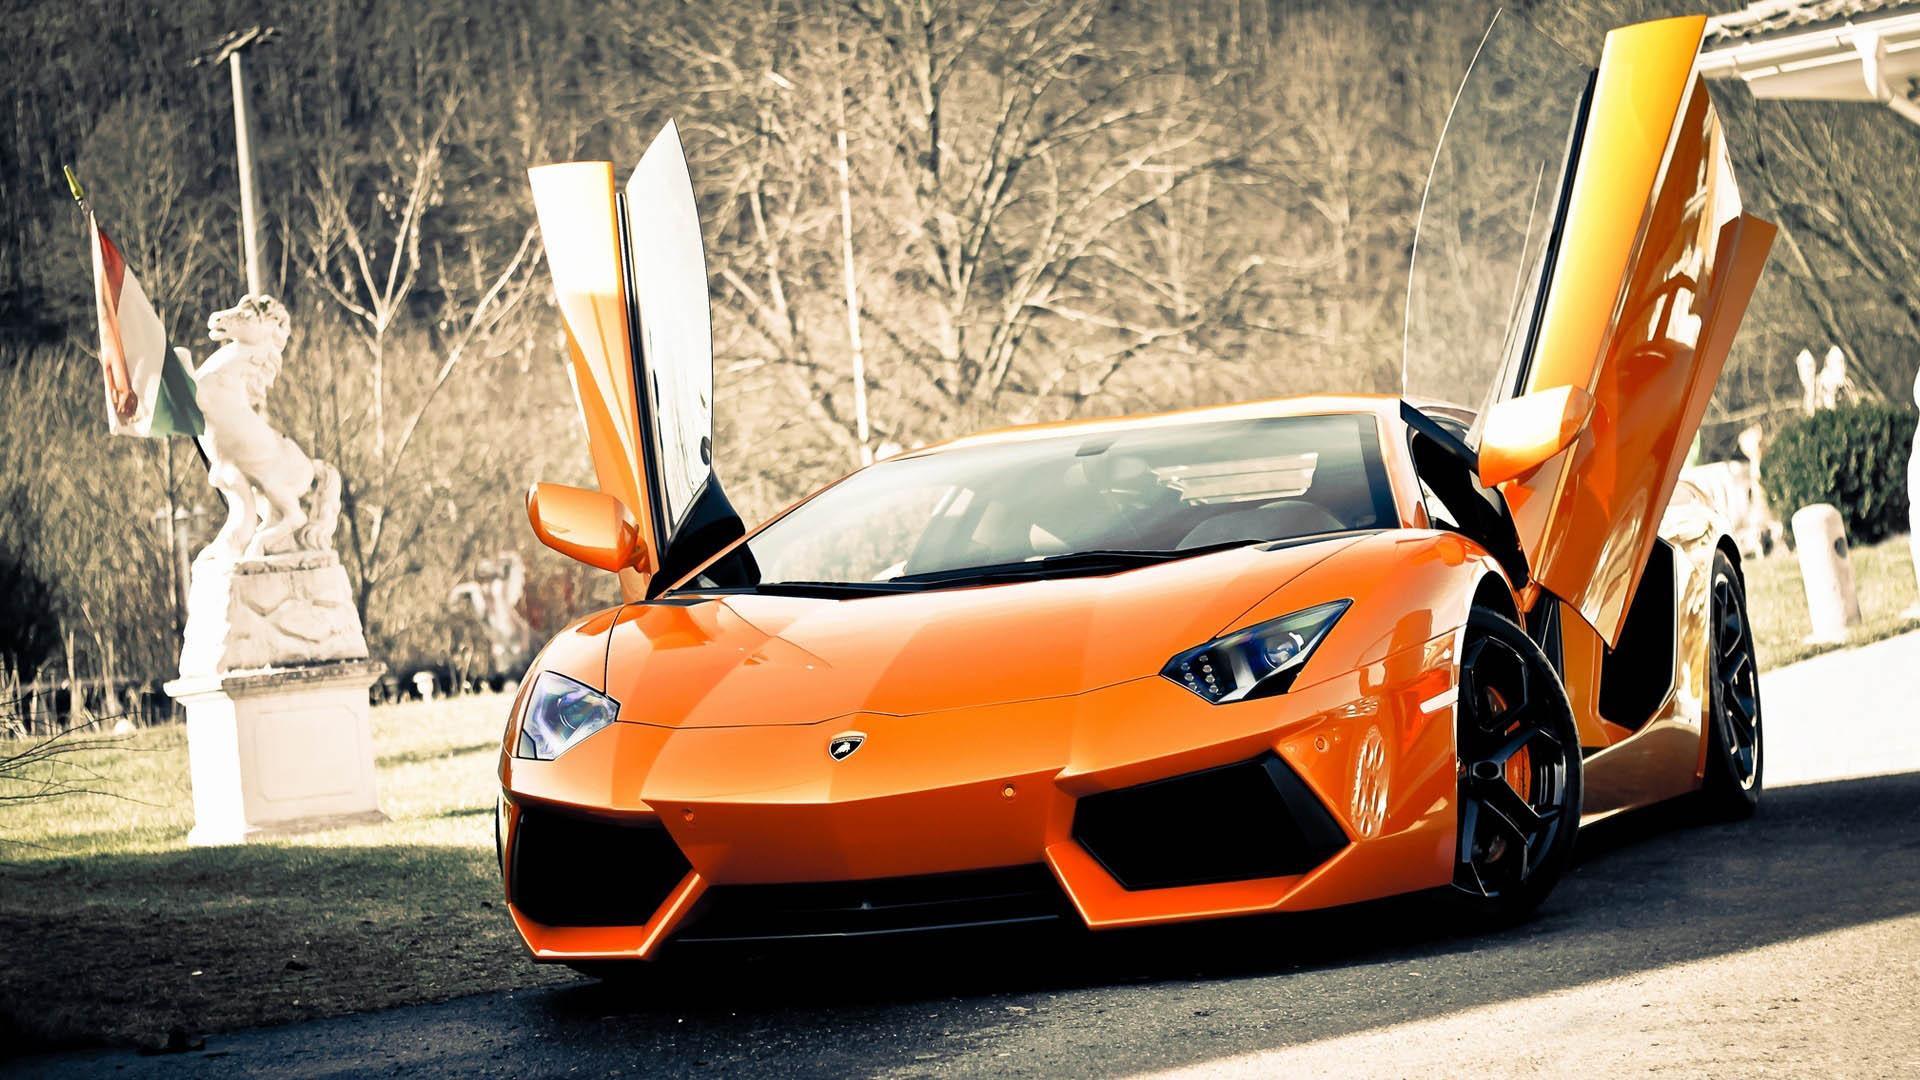 10 Best Super Car Wallpapers Hd Full Hd 1080p For Pc: Super Lamborghini Aventador Car Full HD Wallpaper